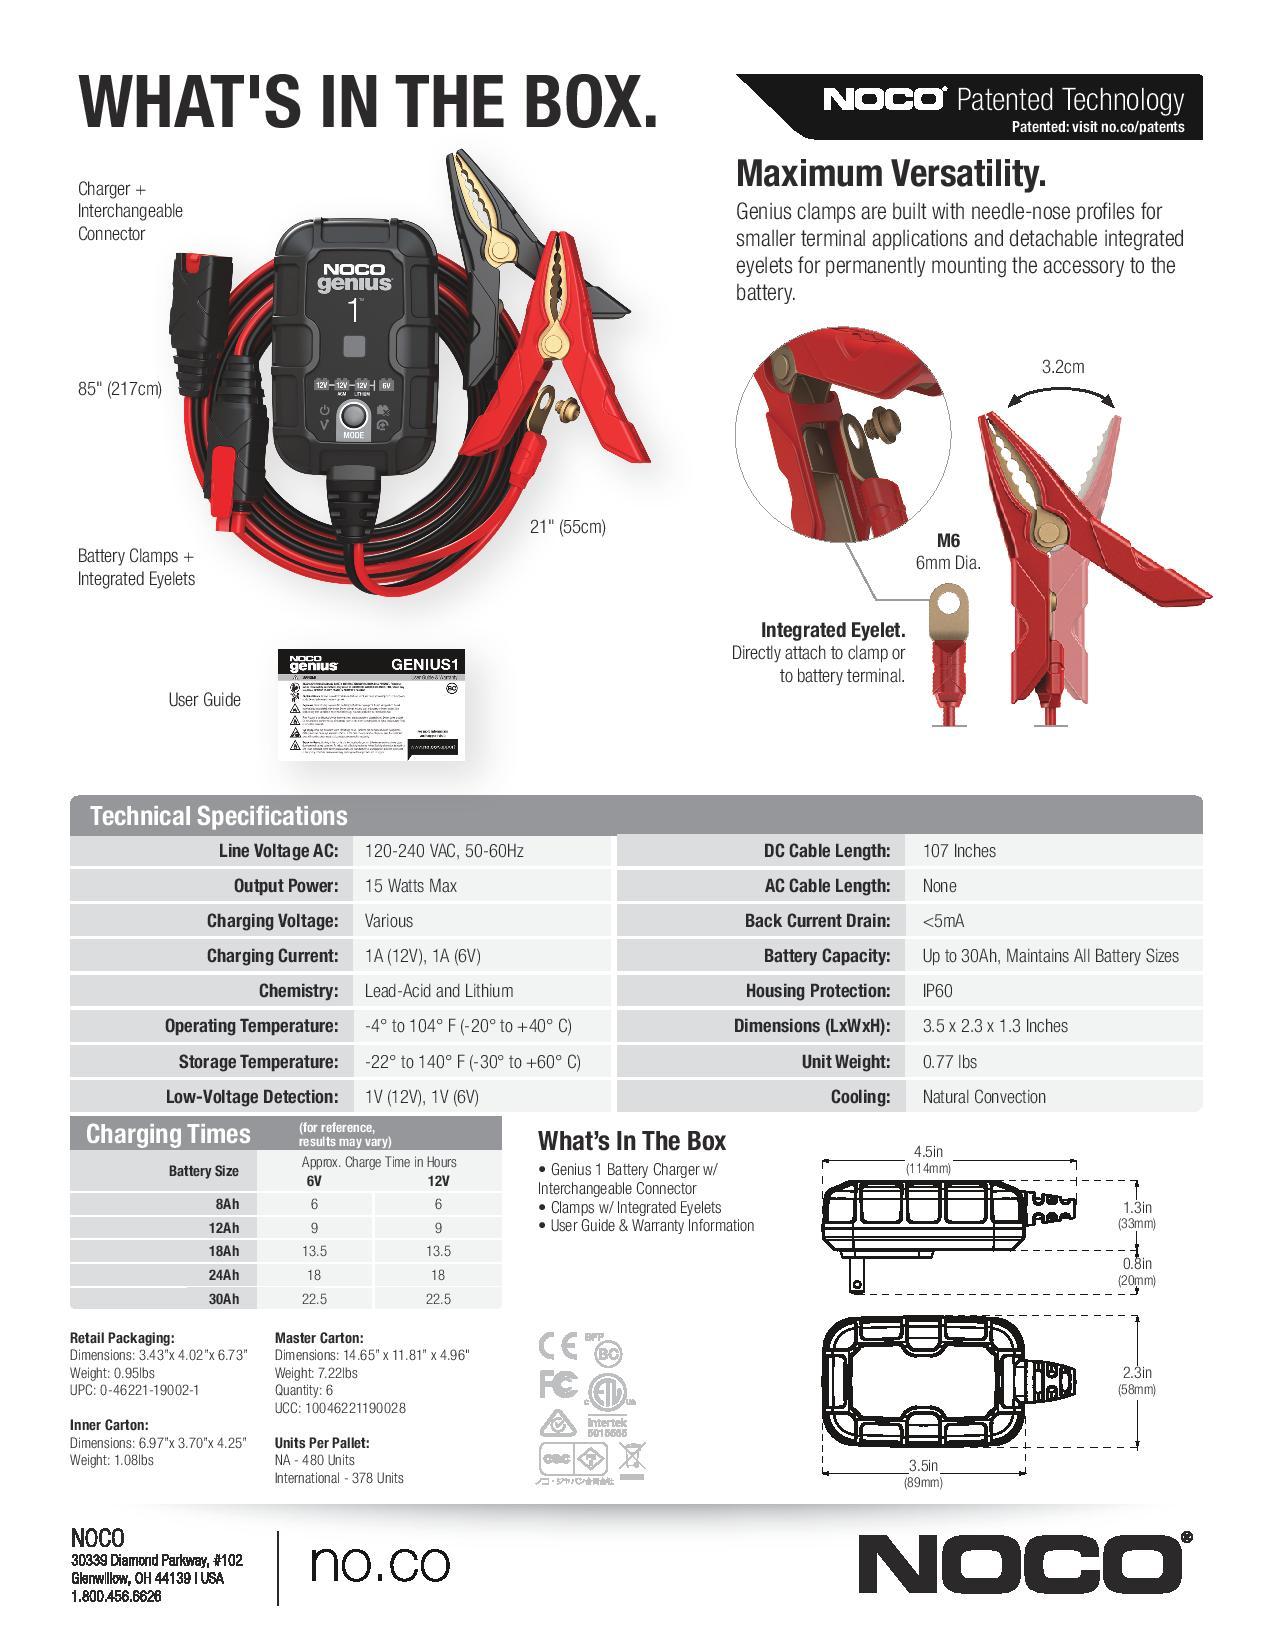 NOCO GENIUS1 6V/12V 1-Amp Smart Battery Charger - Maiden Electronics